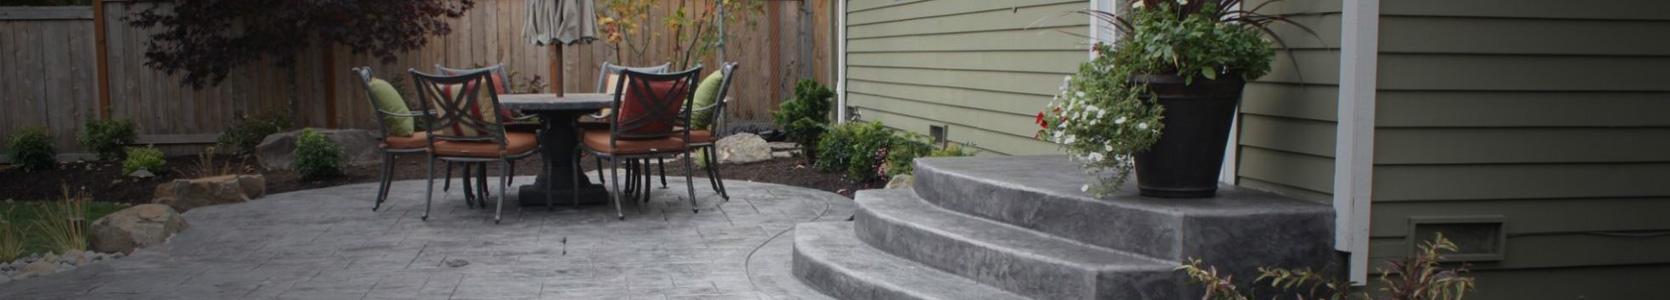 Rešenja za garaže, dvorište, i terase